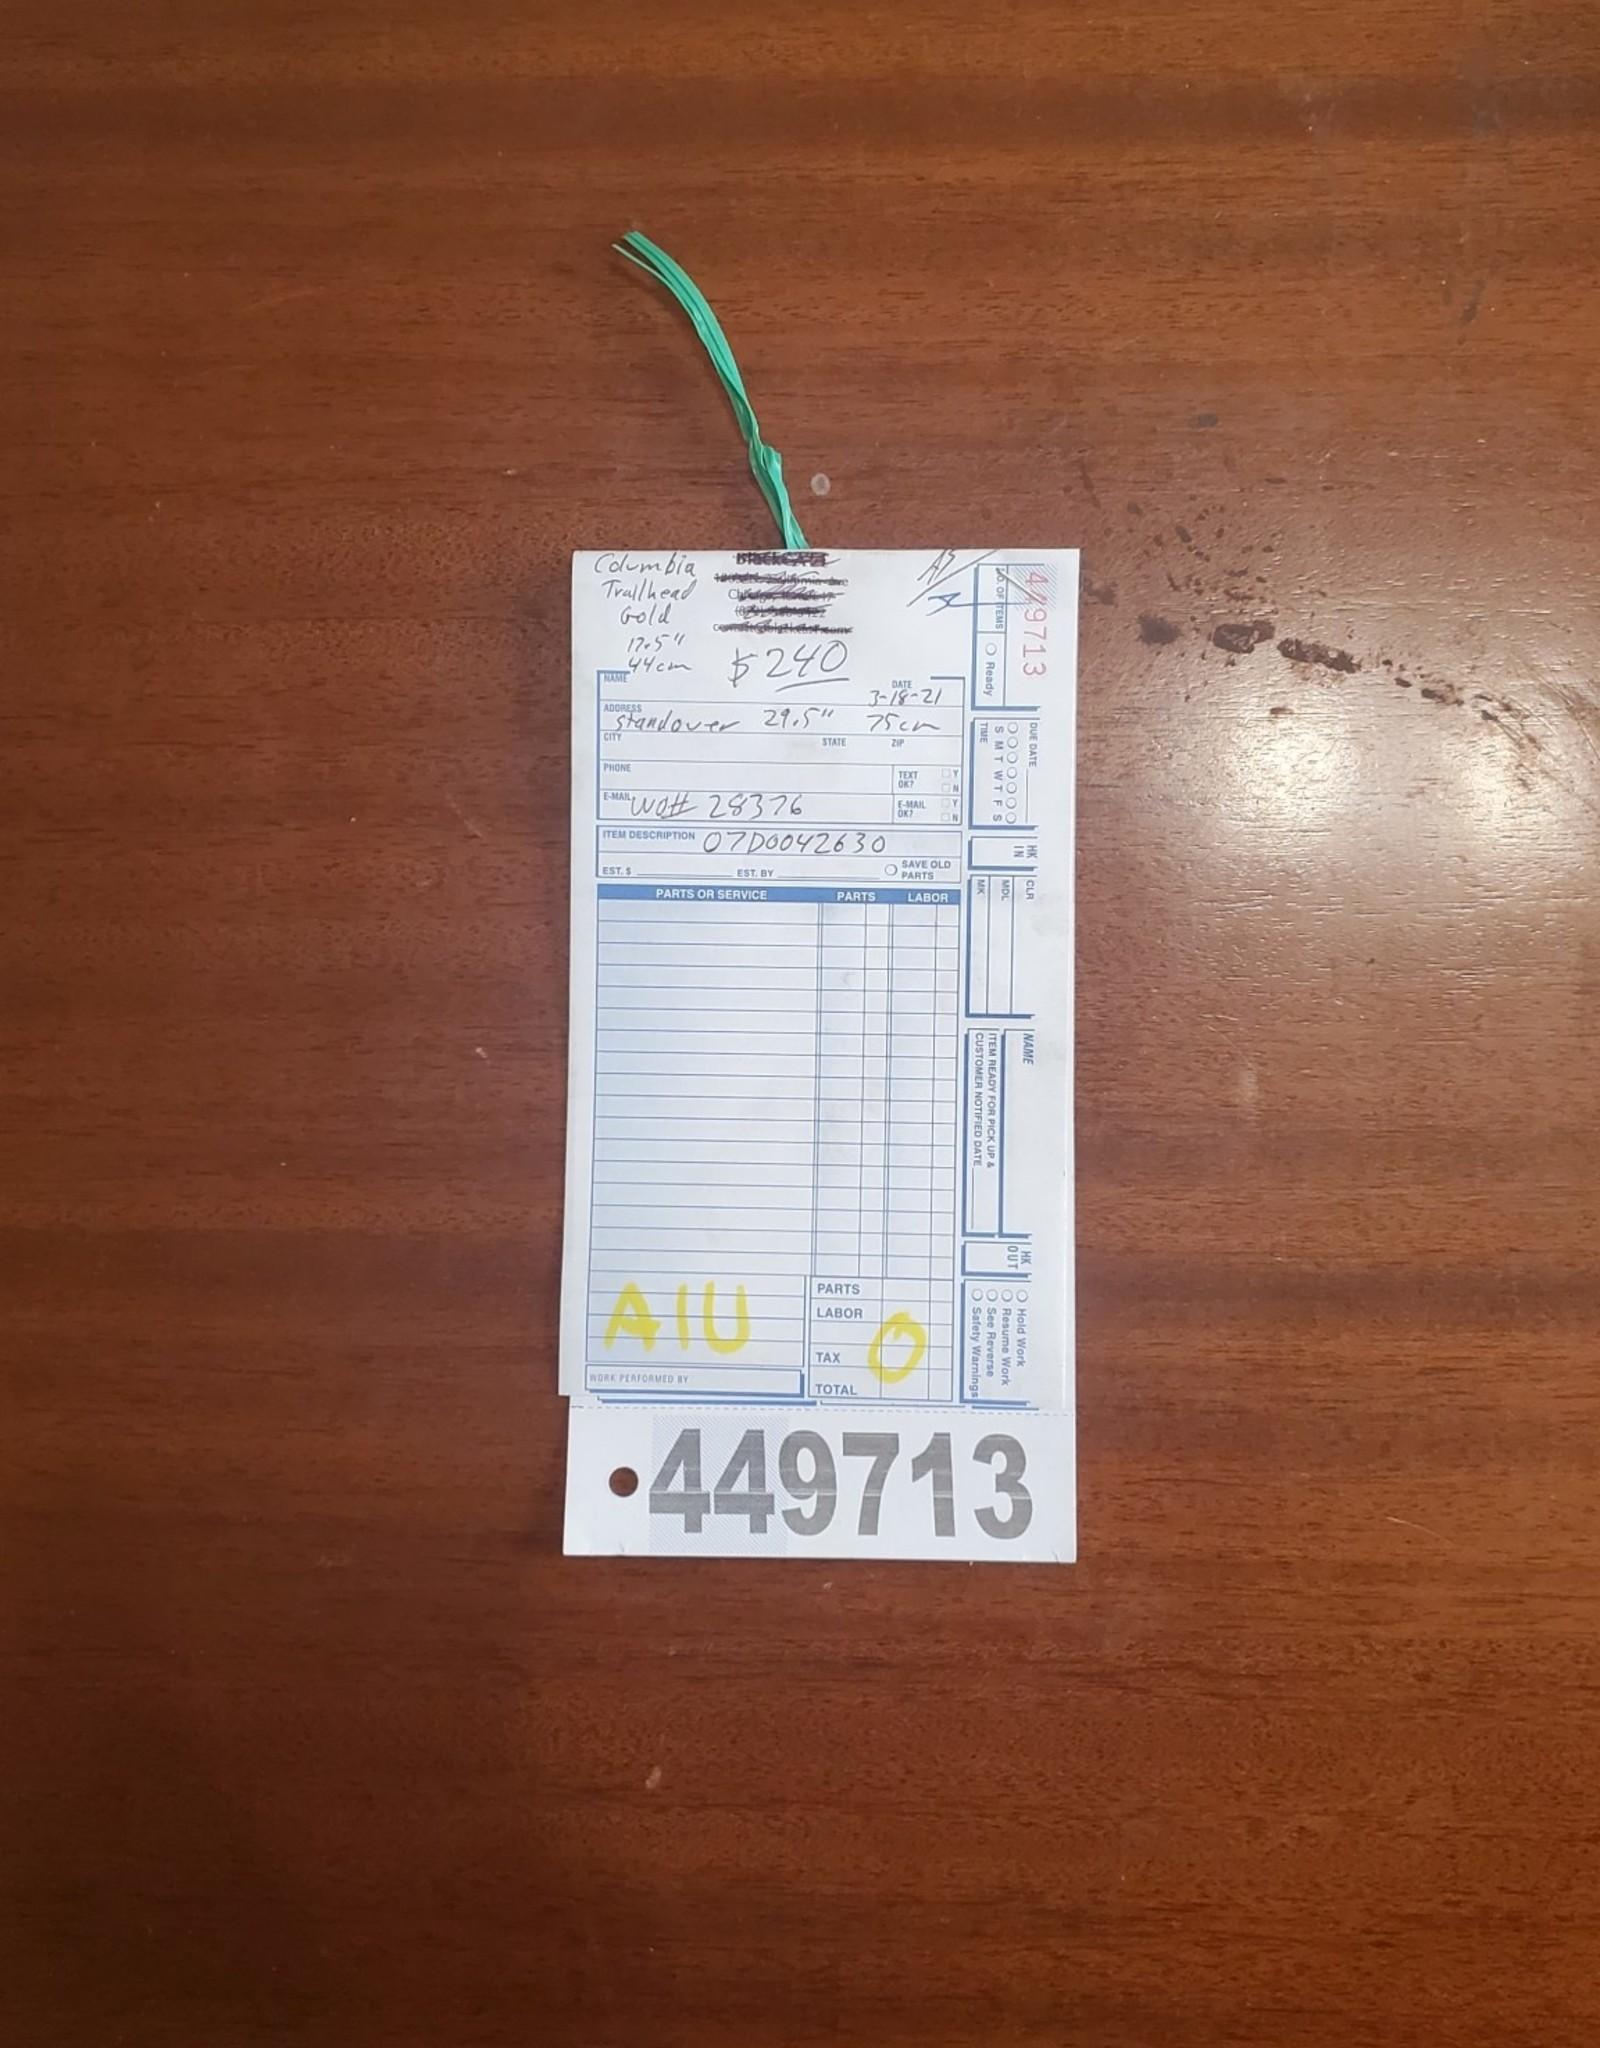 "17.5"" Columbia Trailhead (2630 A1U)"